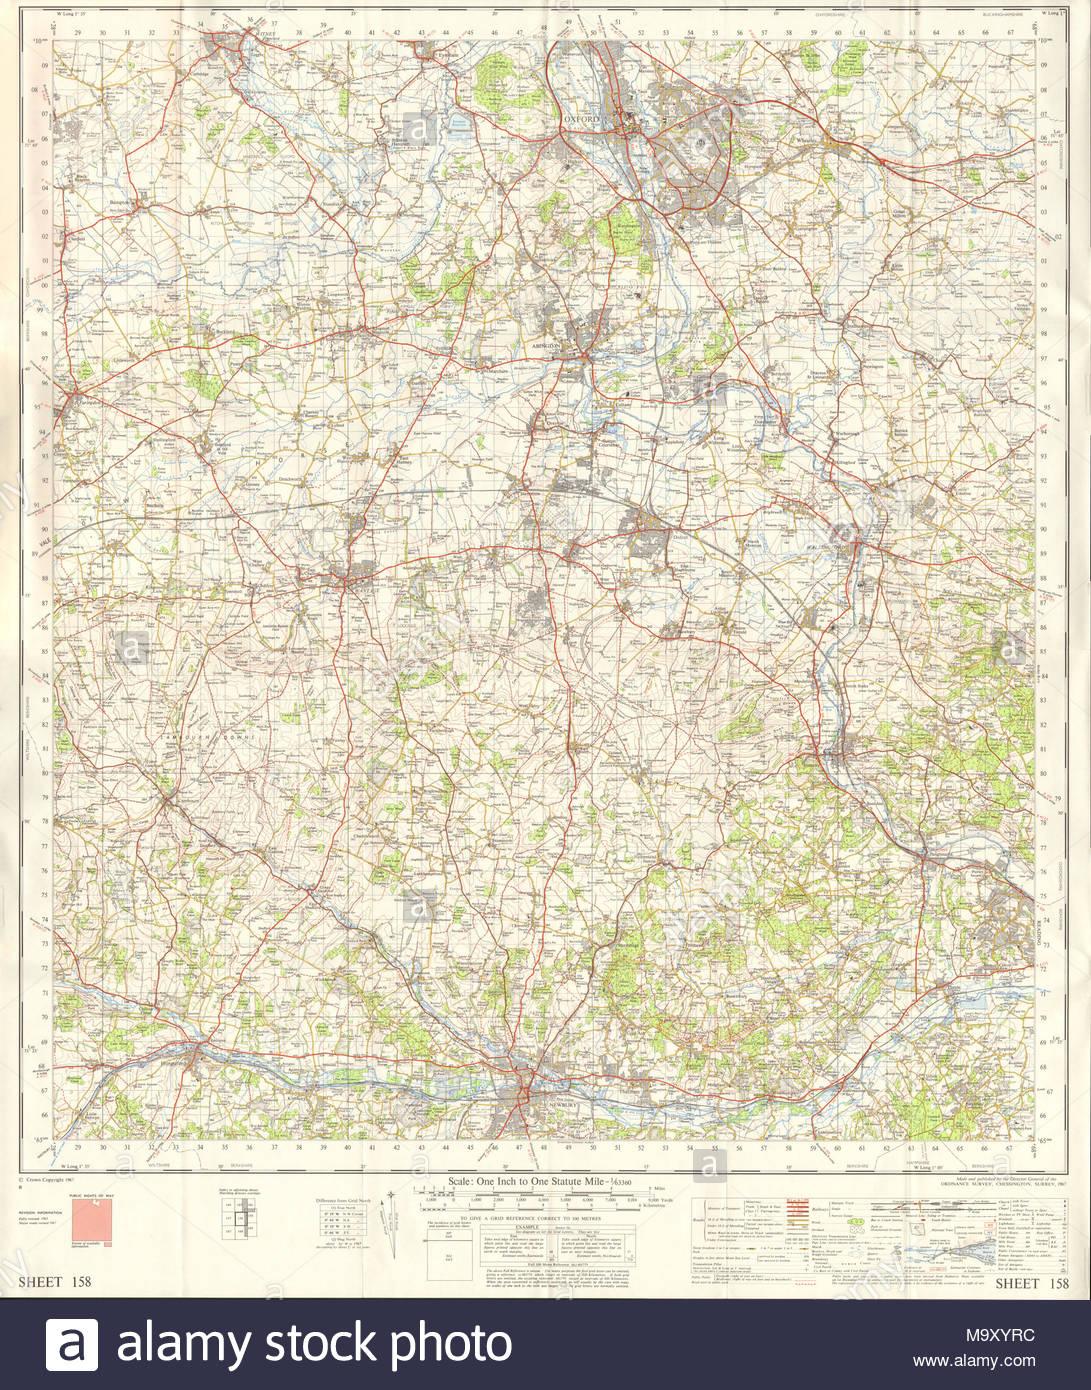 Berkshire Hampshire: Berkshire Map Stock Photos & Berkshire Map Stock Images